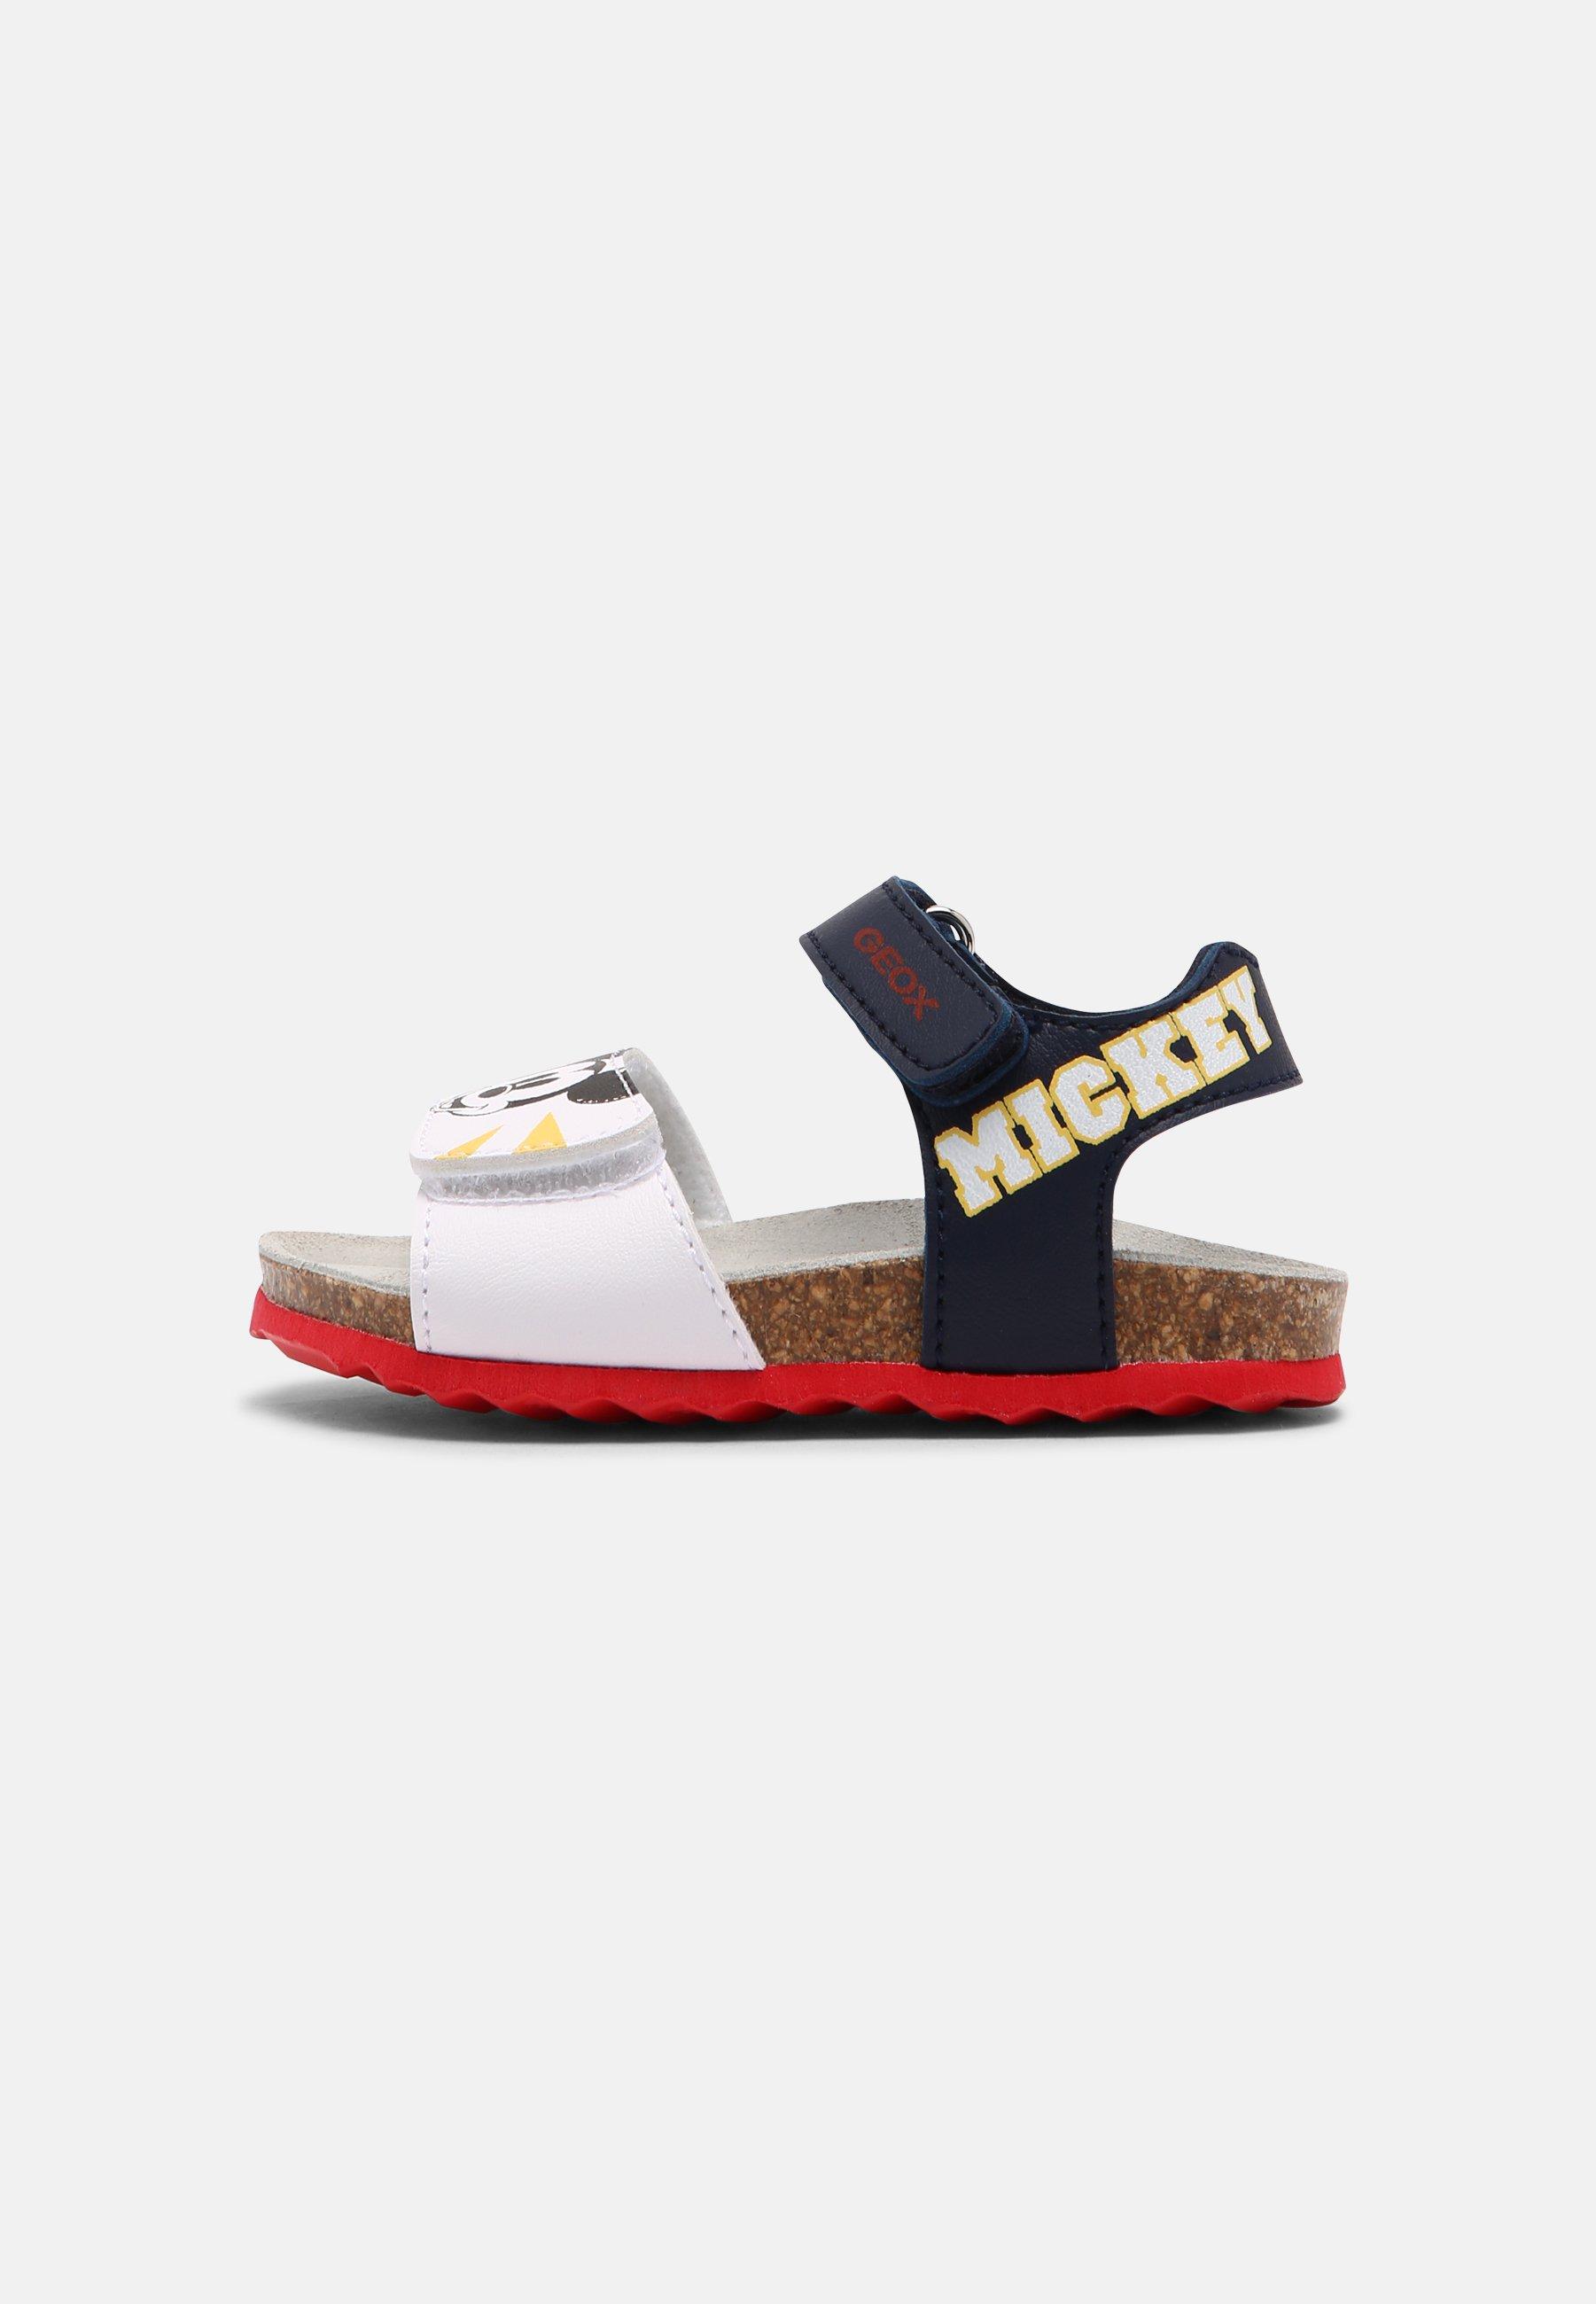 Kids DISNEY MICKEY MOUSE BABY CHALKI UNISEX GEOX - Sandals - Sandals